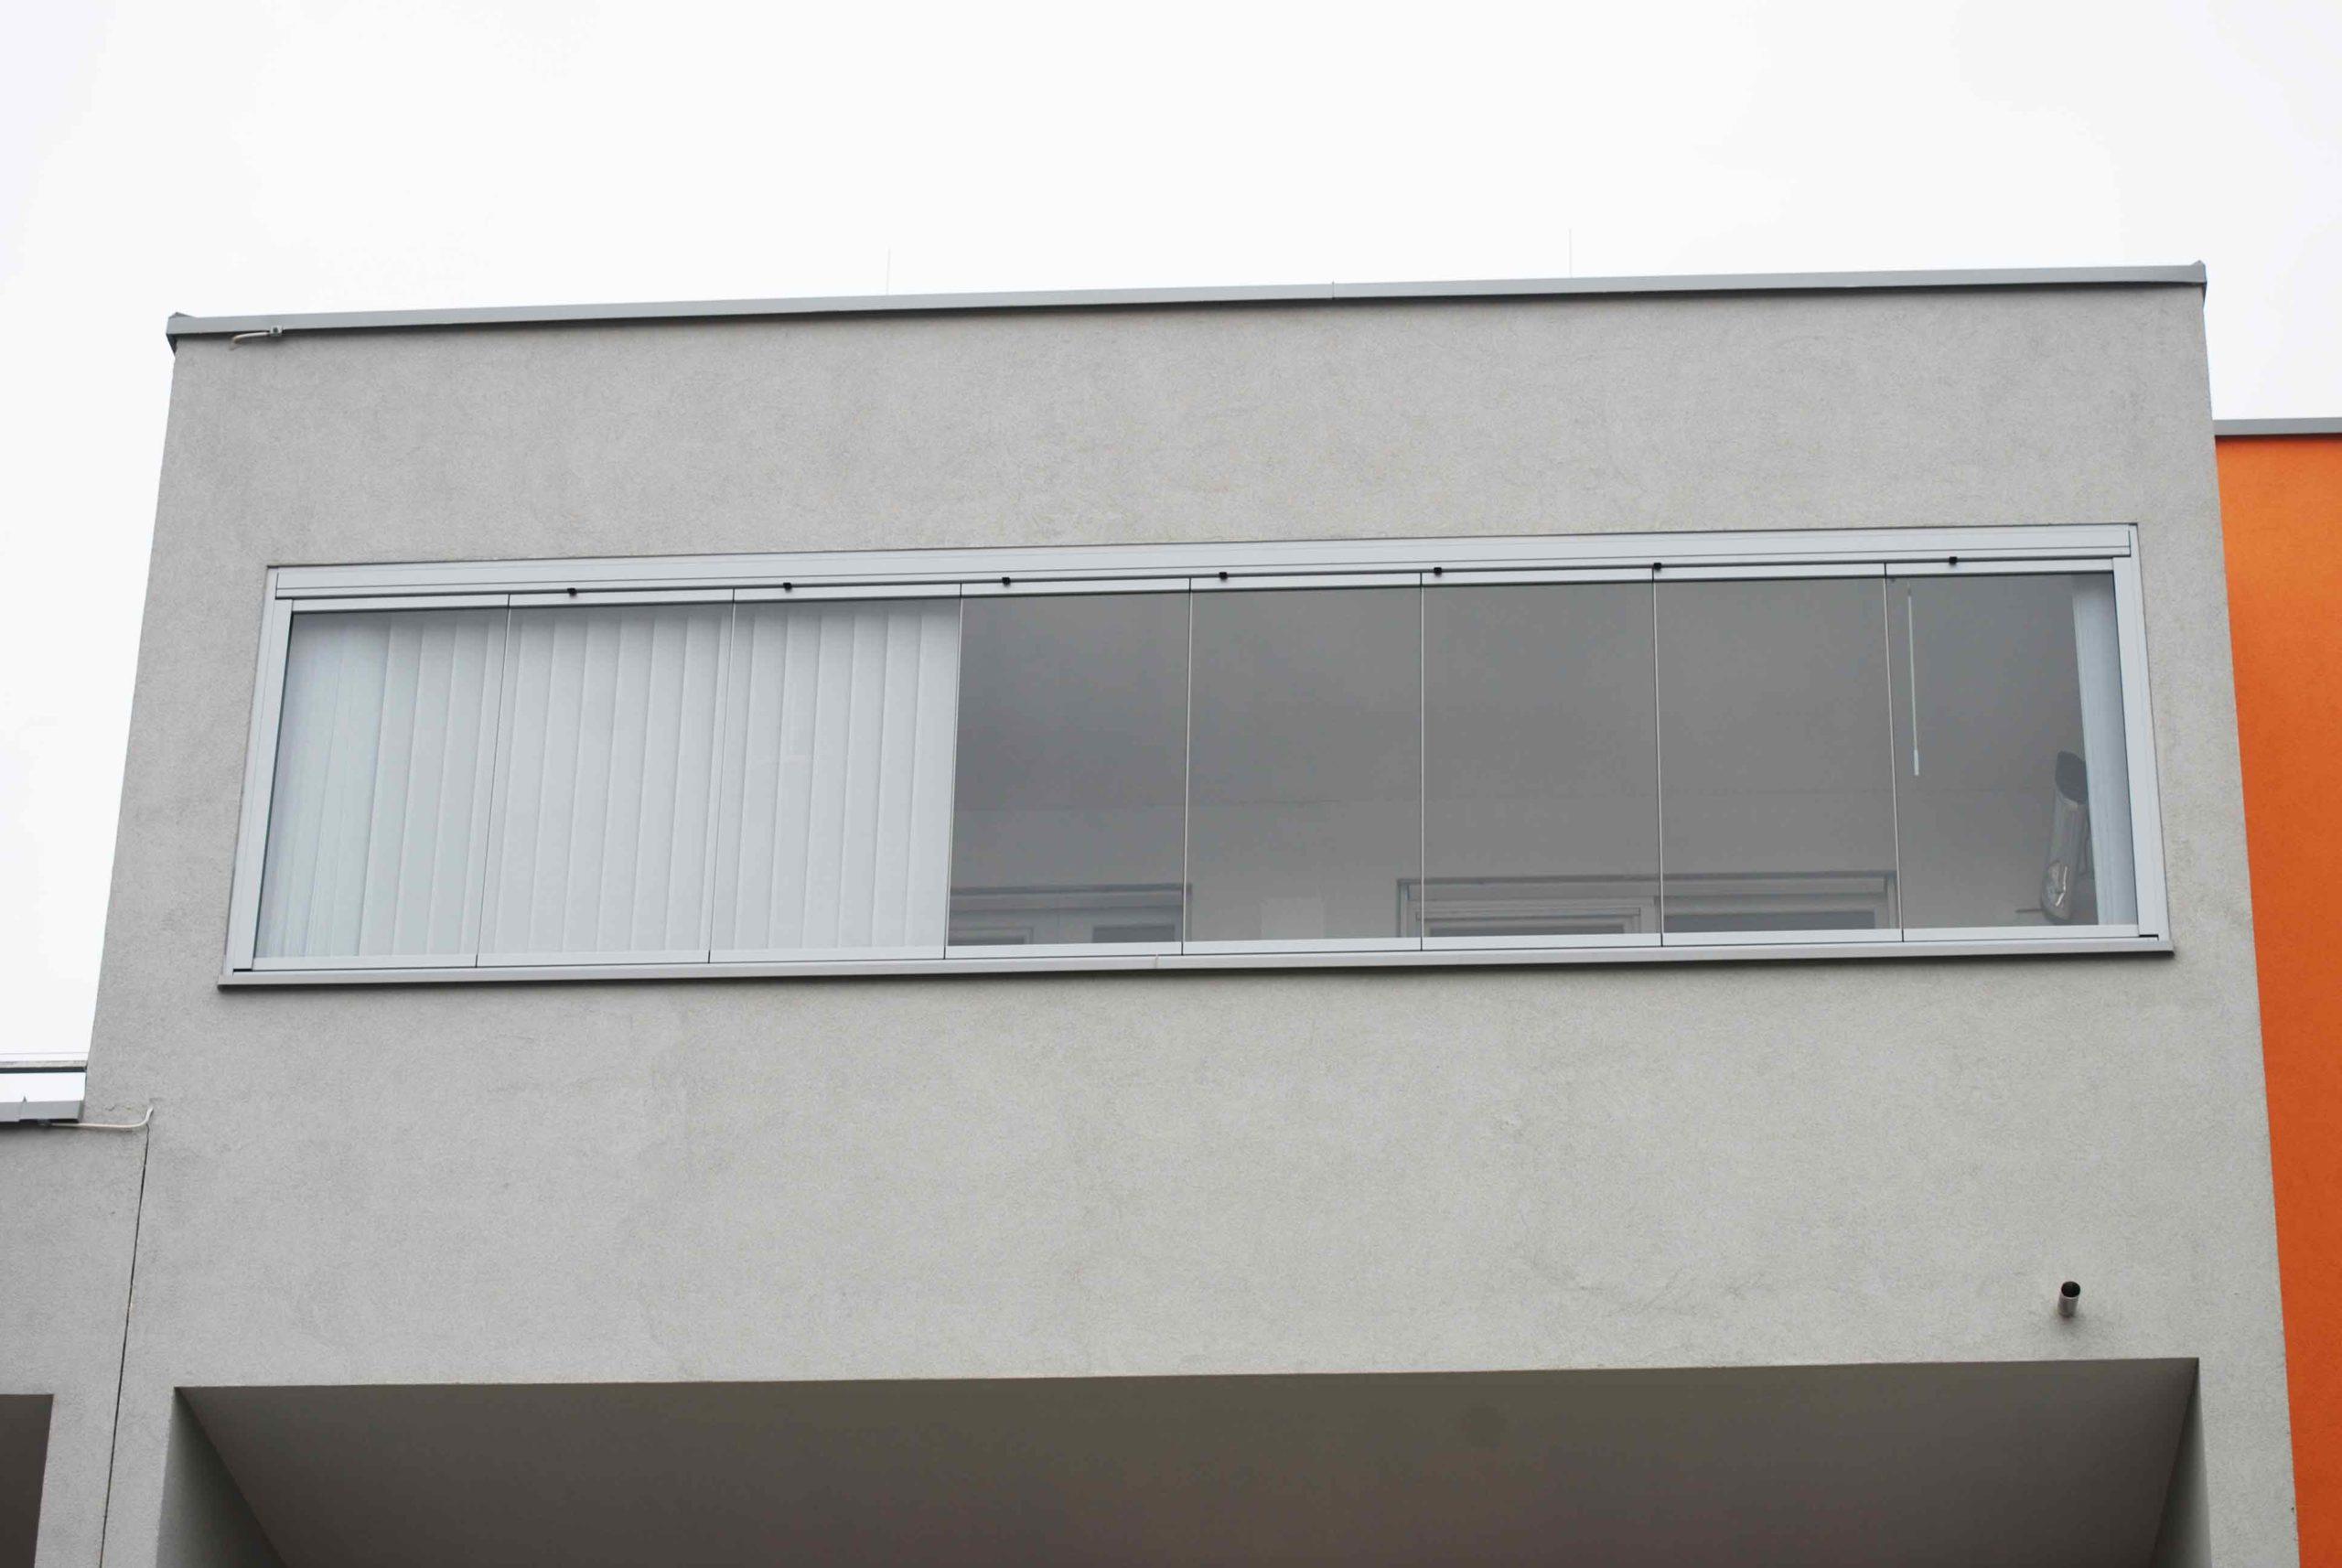 8-teilige Balkonverglasung faltbar